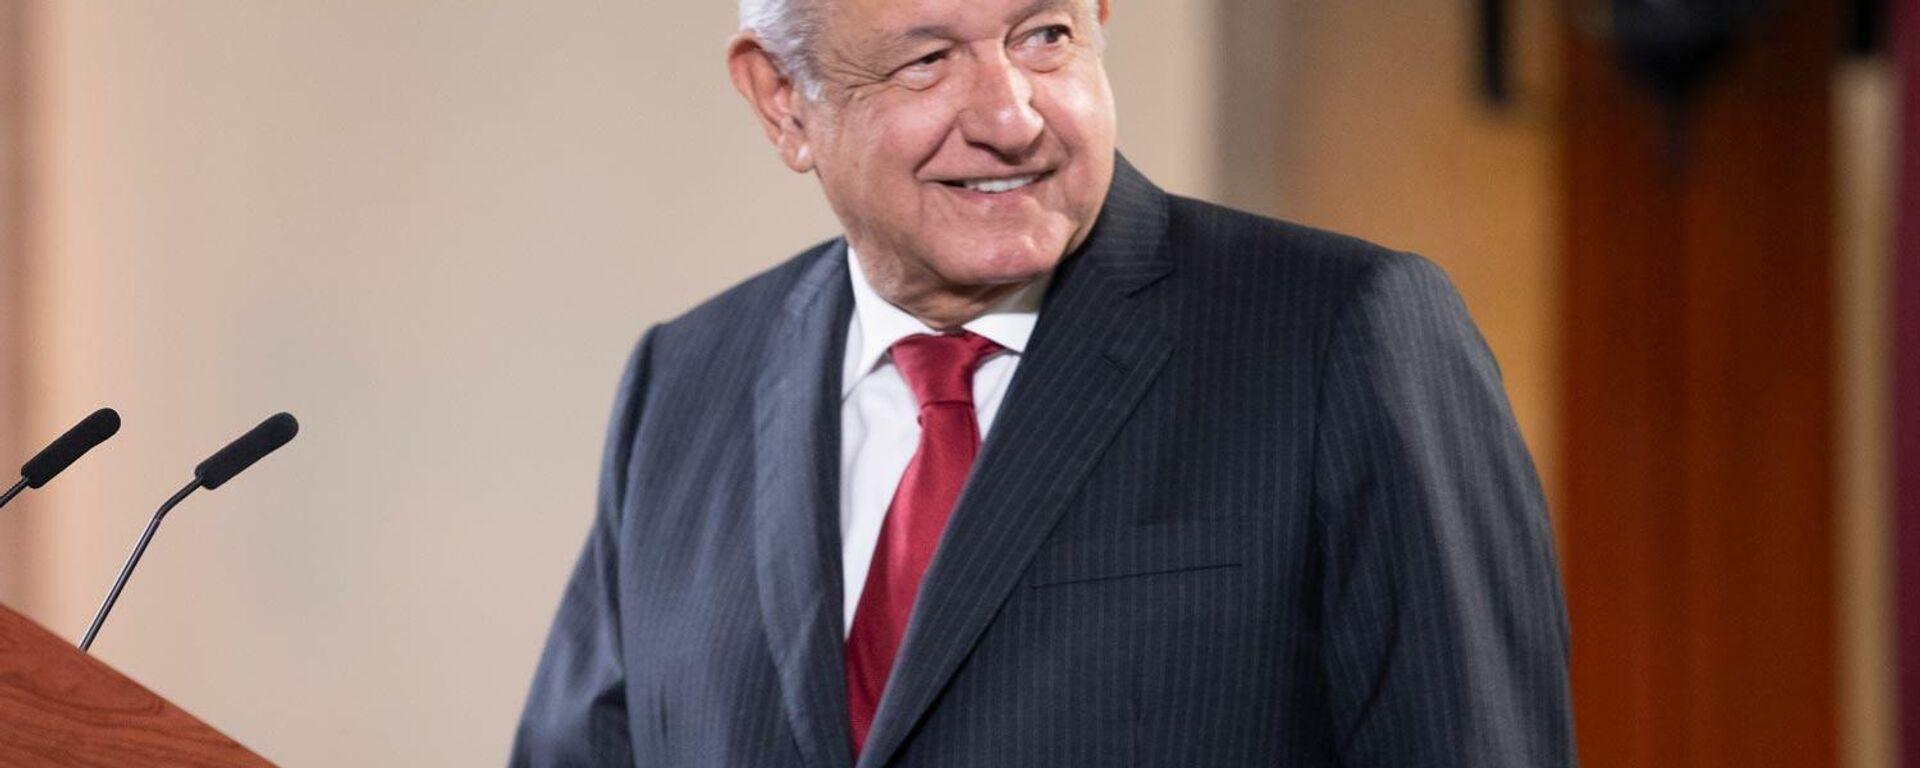 Andrés Manuel López Obrador - Sputnik Mundo, 1920, 20.09.2021